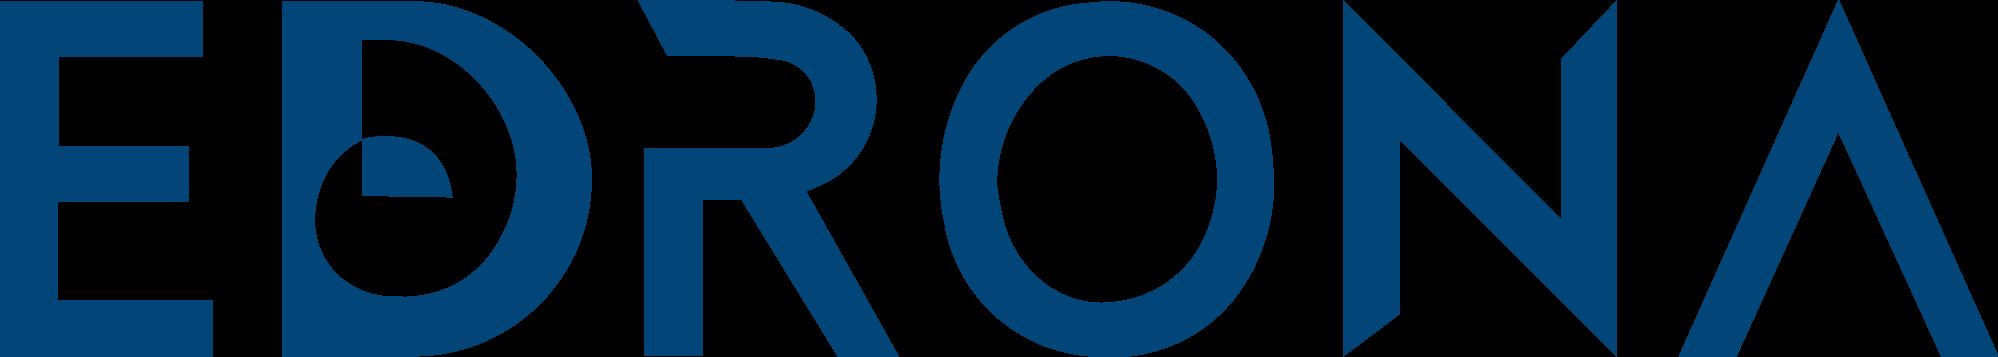 edrona logo desktop